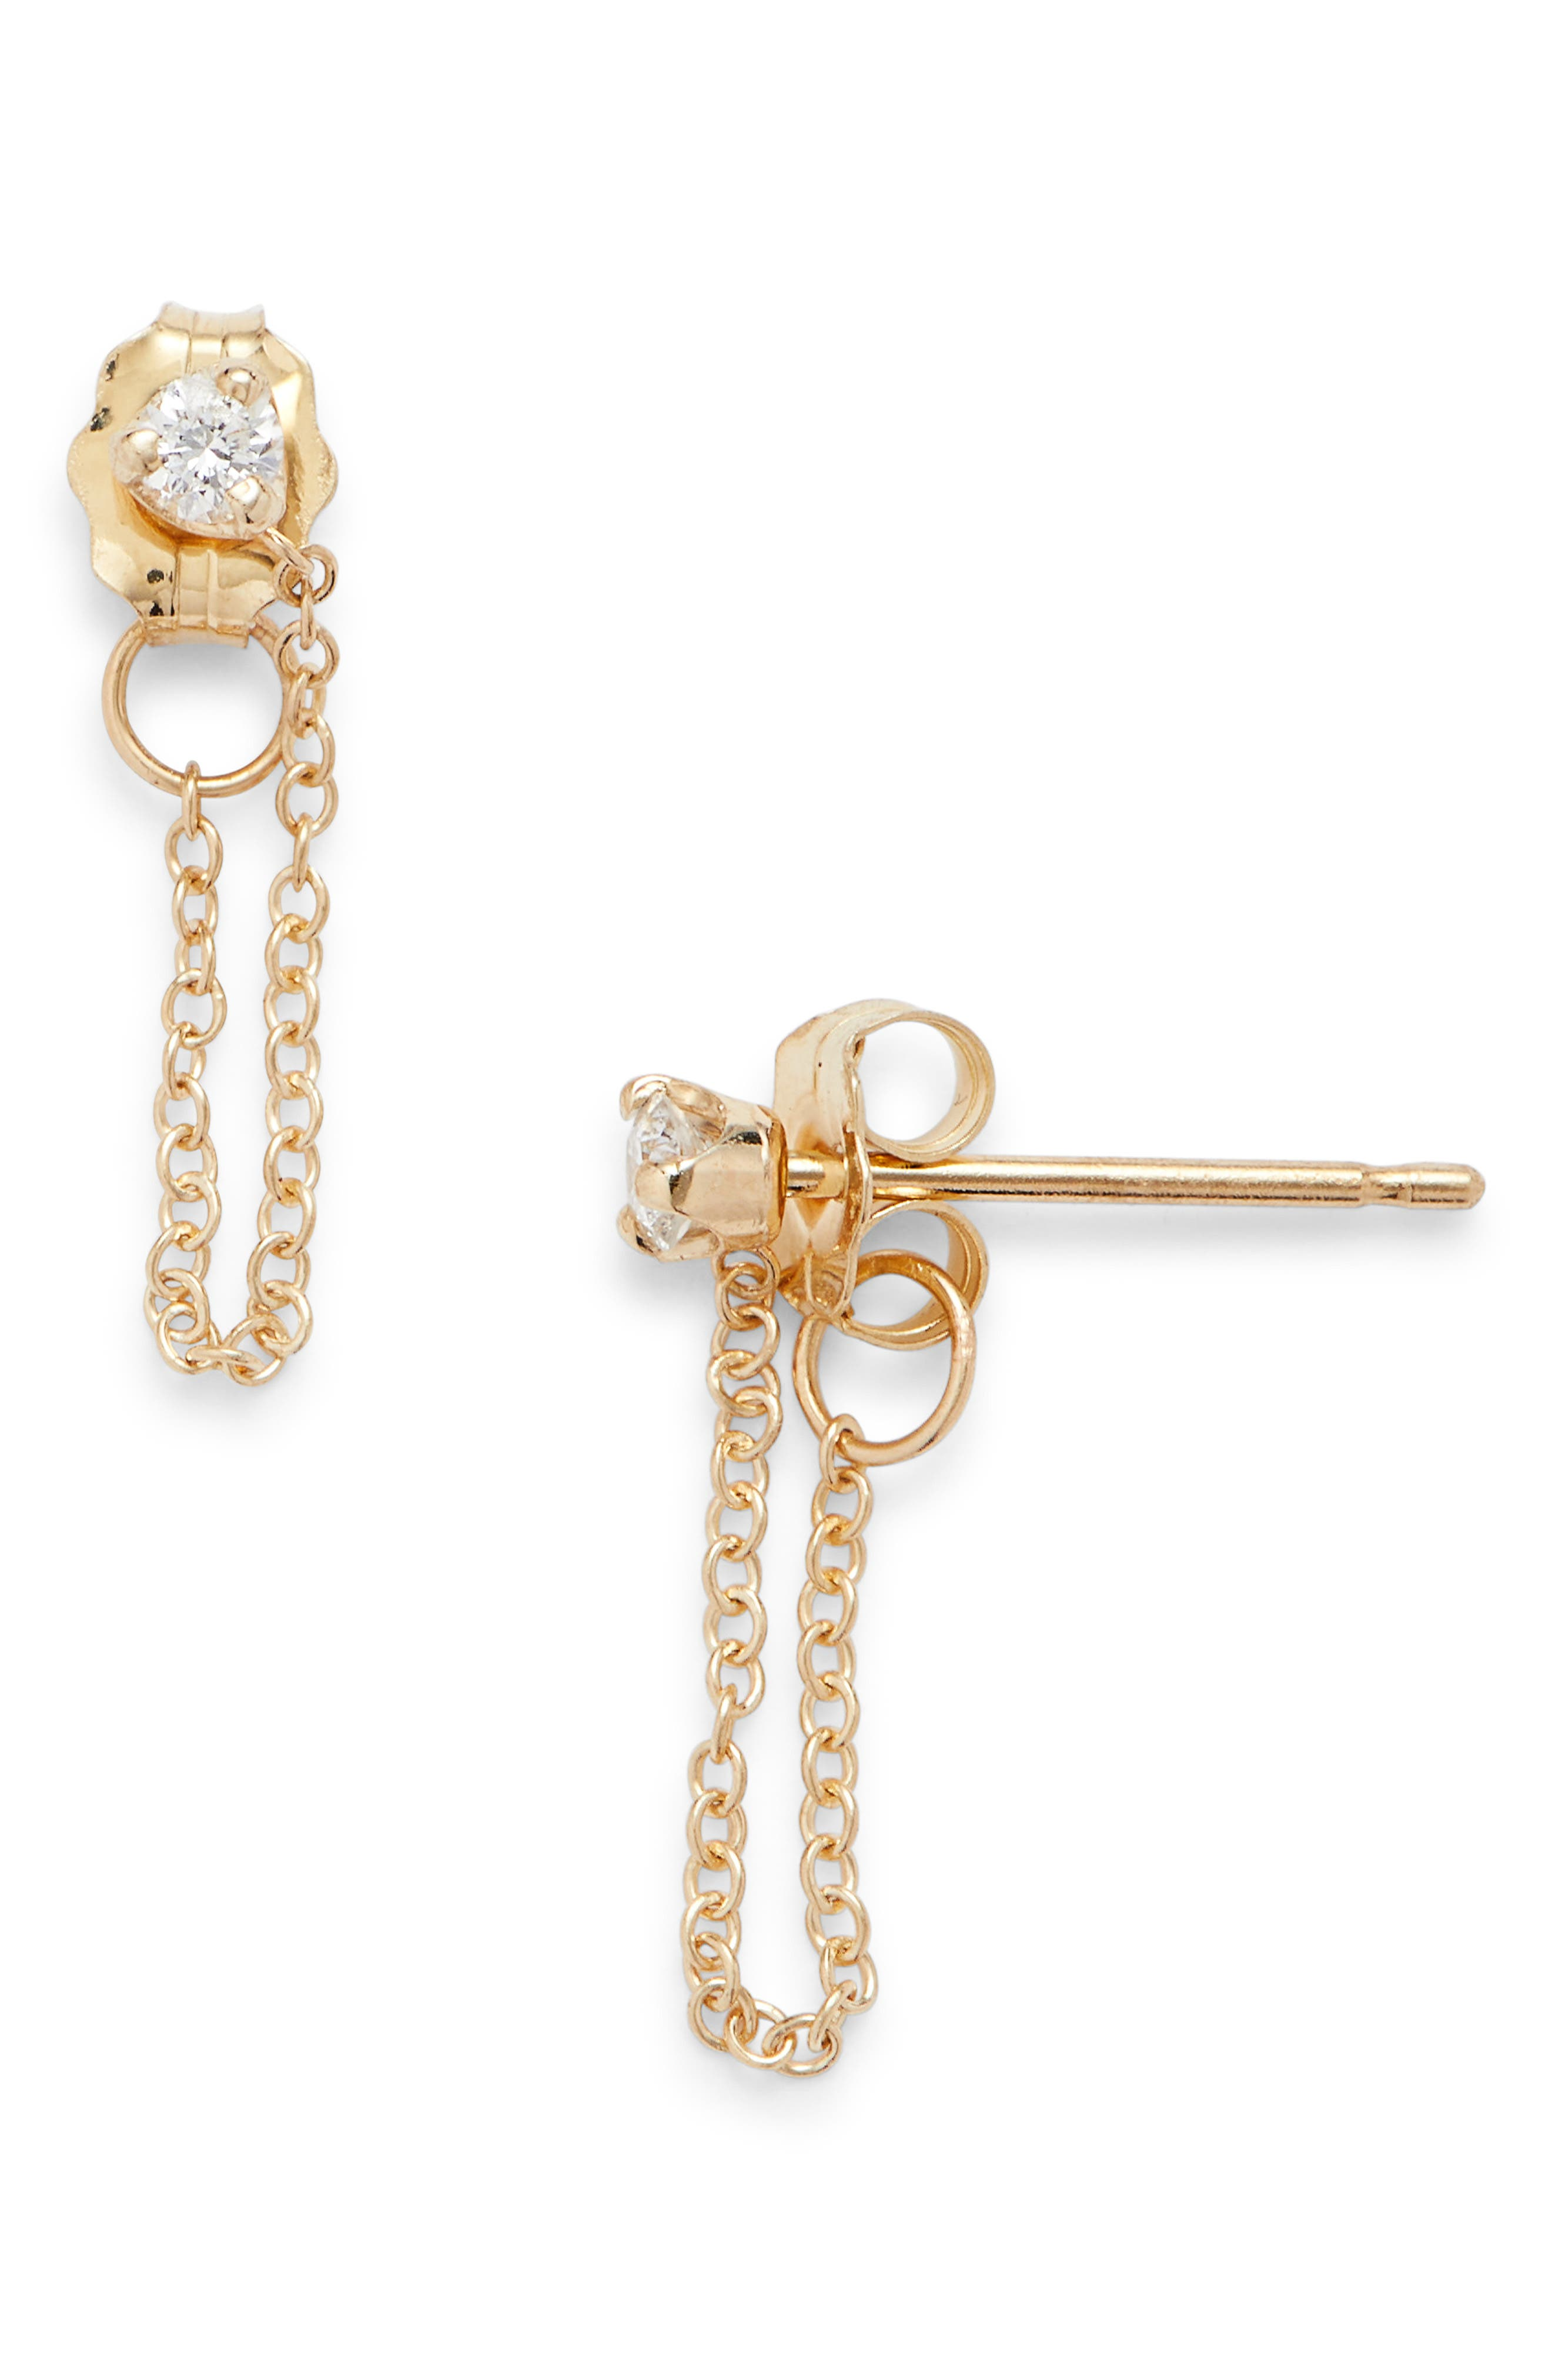 Diamond Chain Stud Earrings,                             Main thumbnail 1, color,                             Yellow Gold